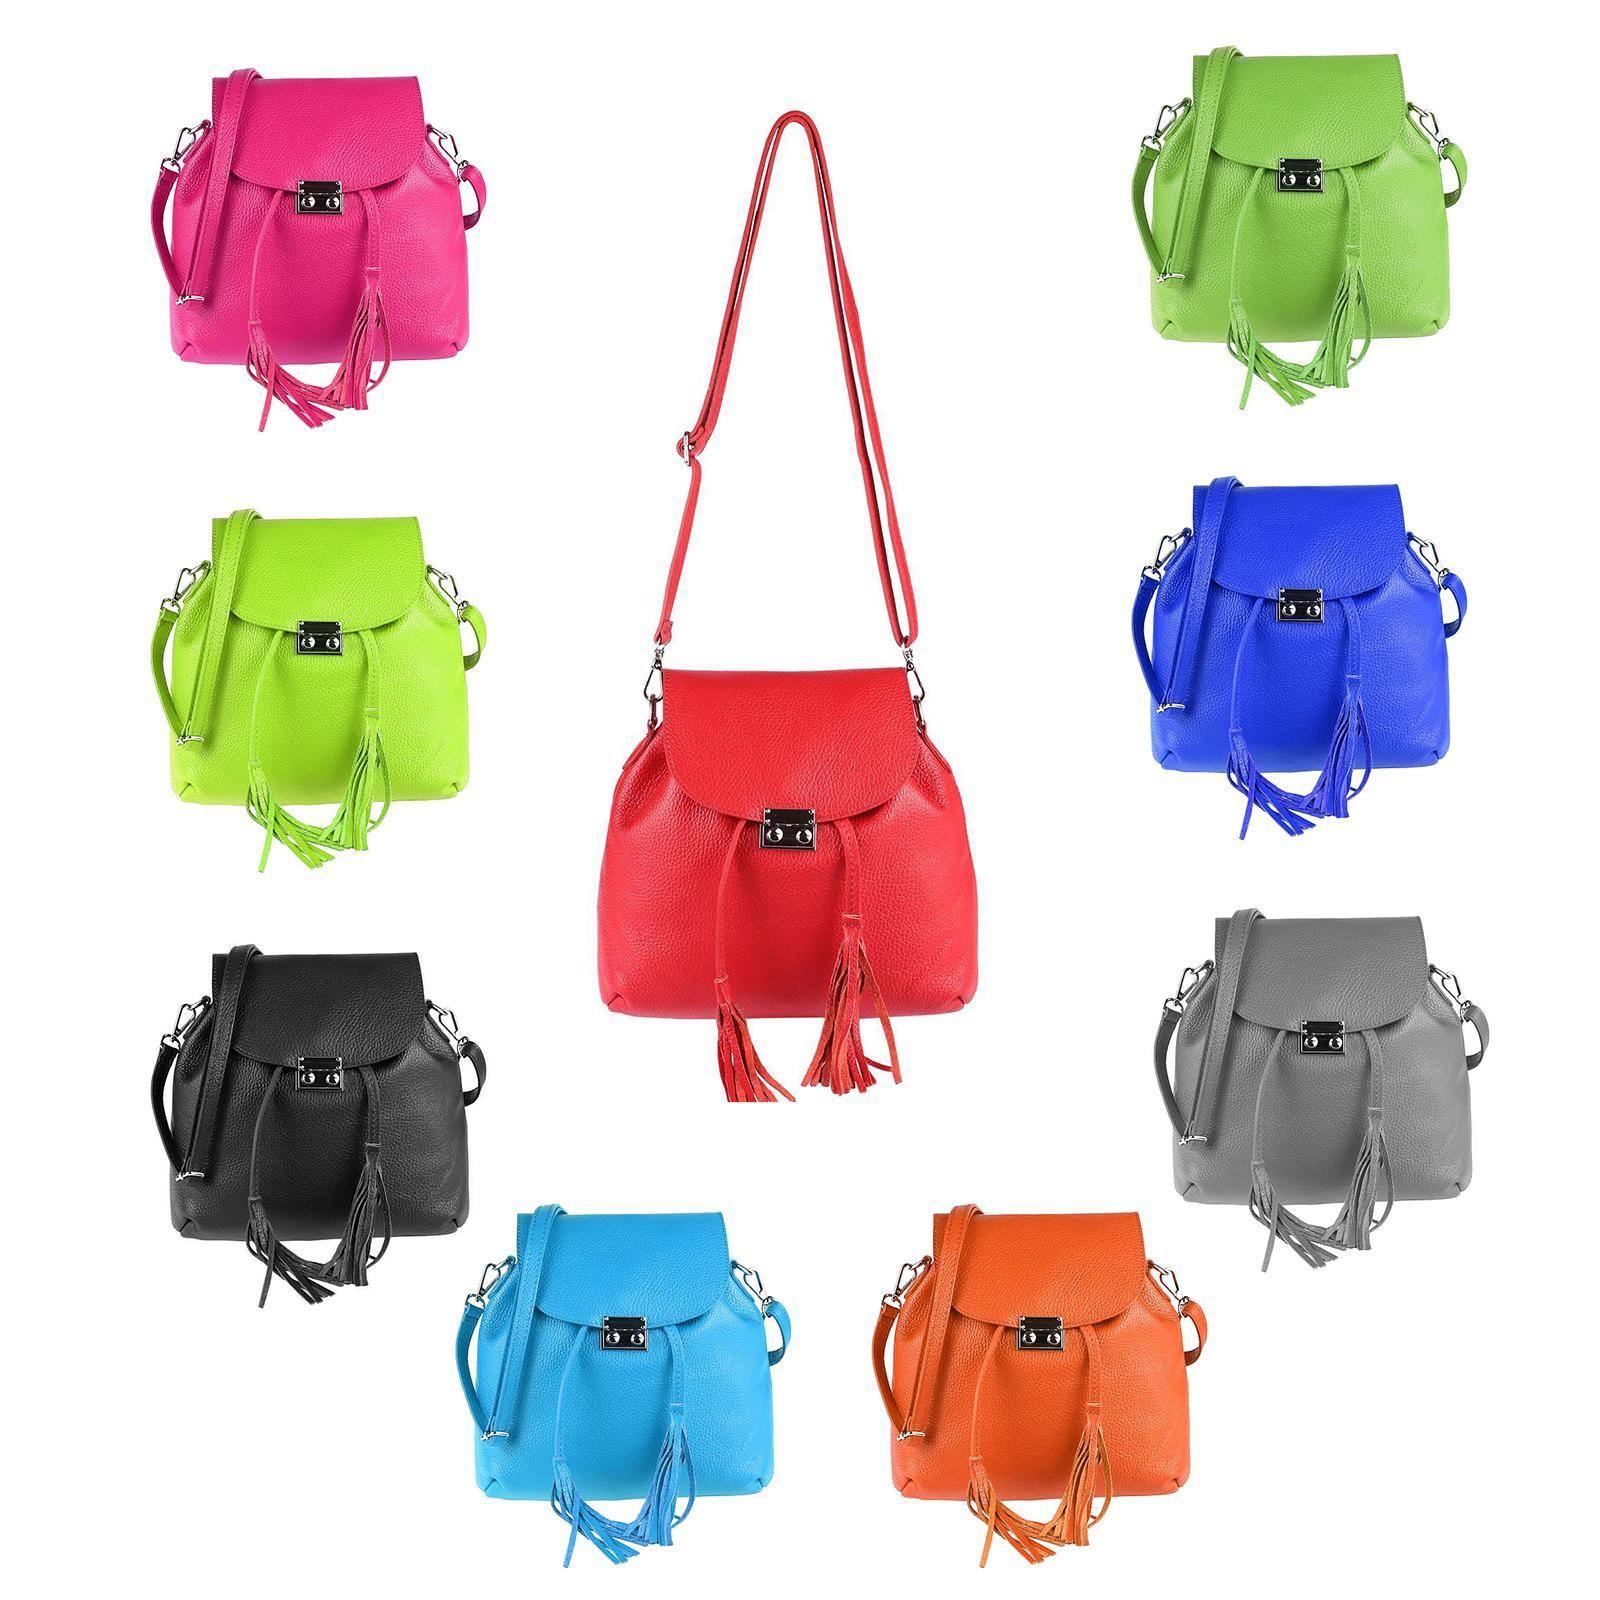 5942e6615989e5 OBC MADE IN ITALY 2in1 DAMEN Echt LEDER TASCHE RUCKSACK Damentasche  Handtasche Schultertasche Umhängetasche Ledertasche